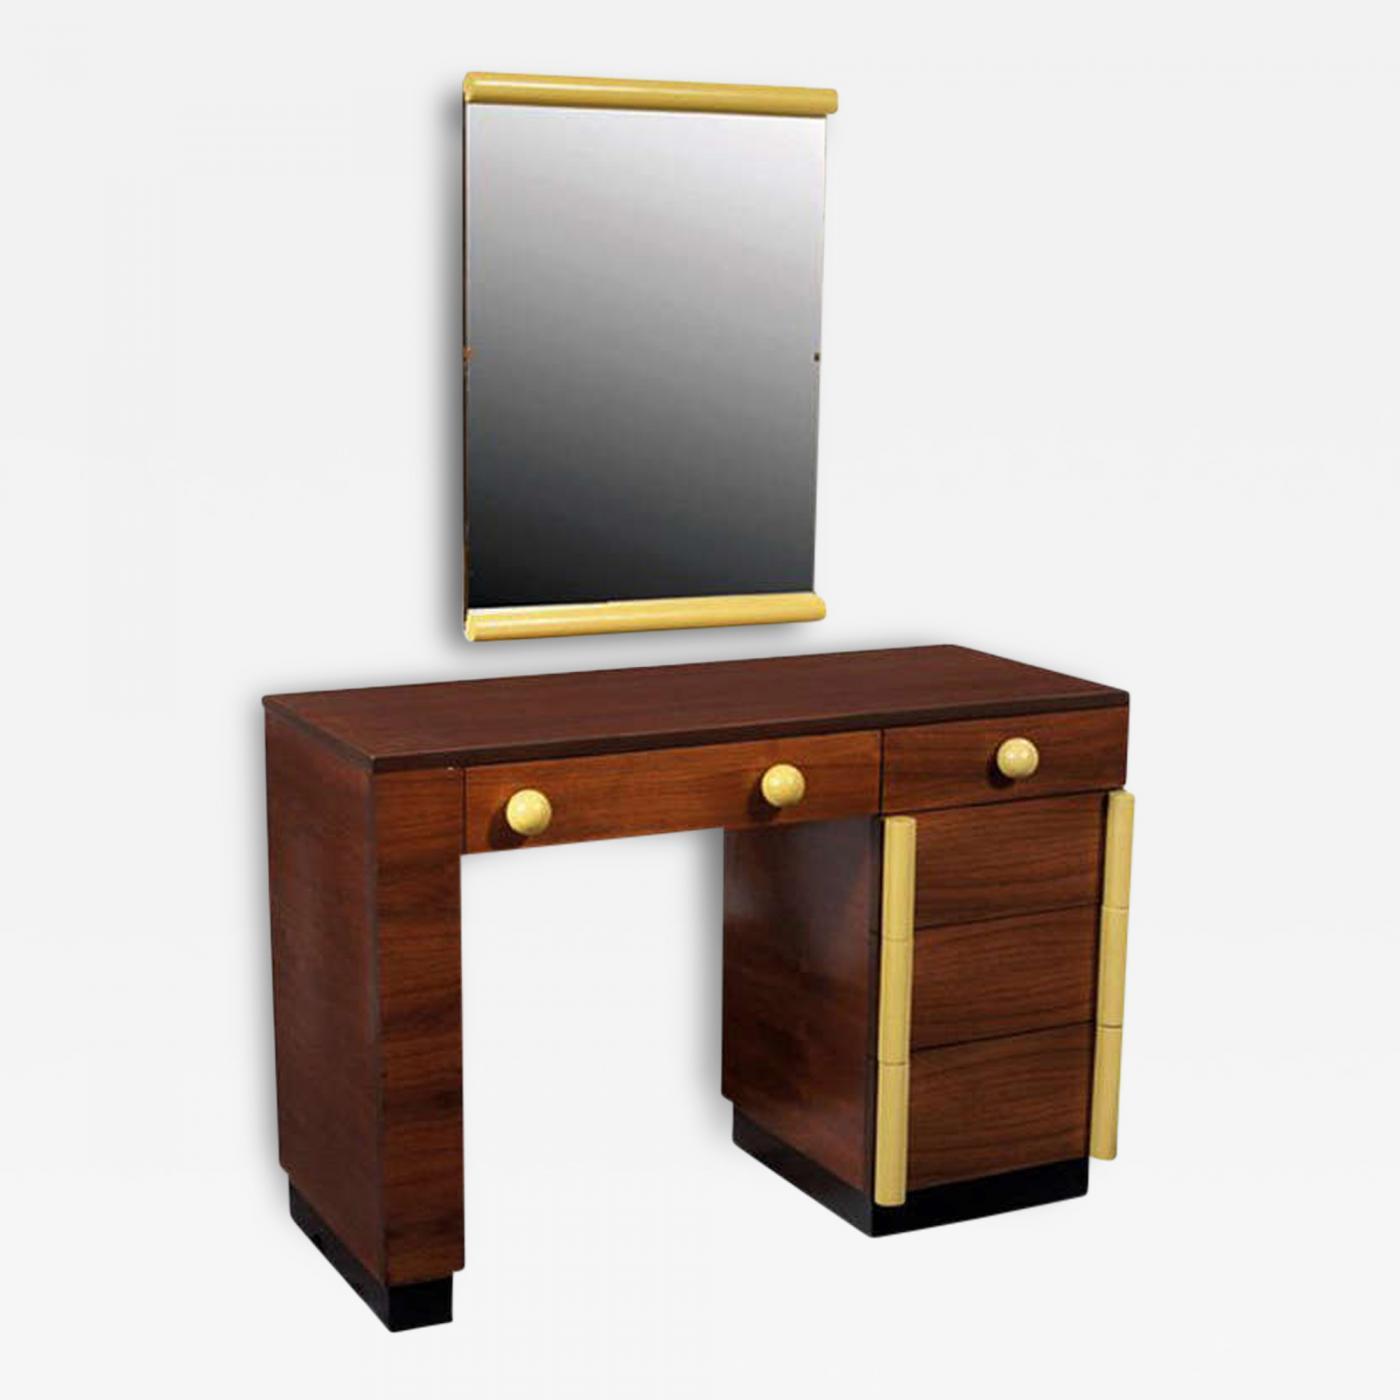 Merveilleux Listings / Furniture / Tables / Desks U0026 Writing Tables · Gilbert Rohde ...